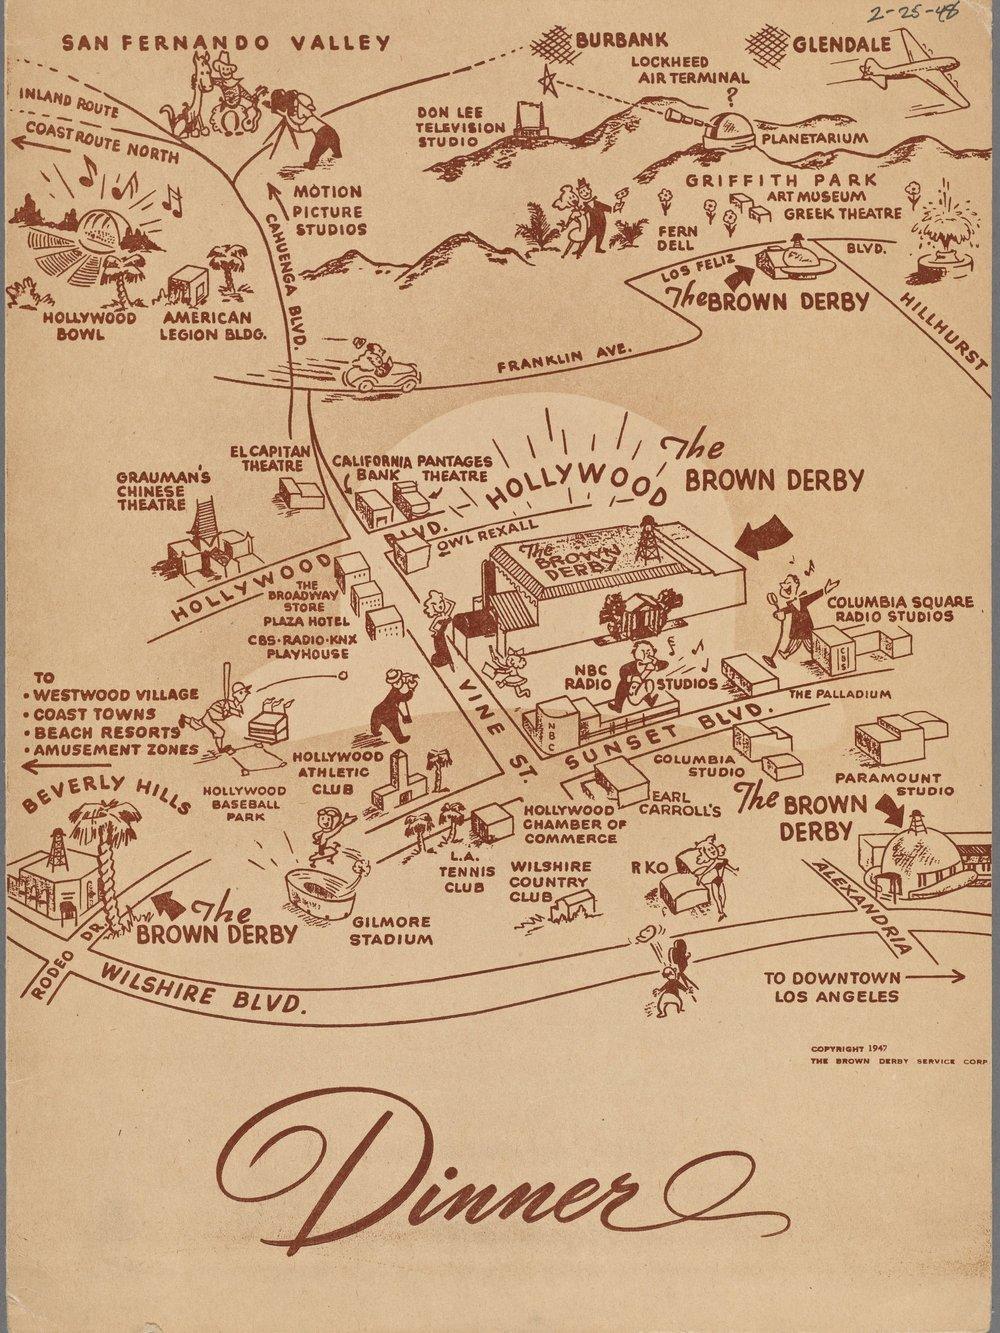 Brown Derby menu - photo via New York Public Library (1948)